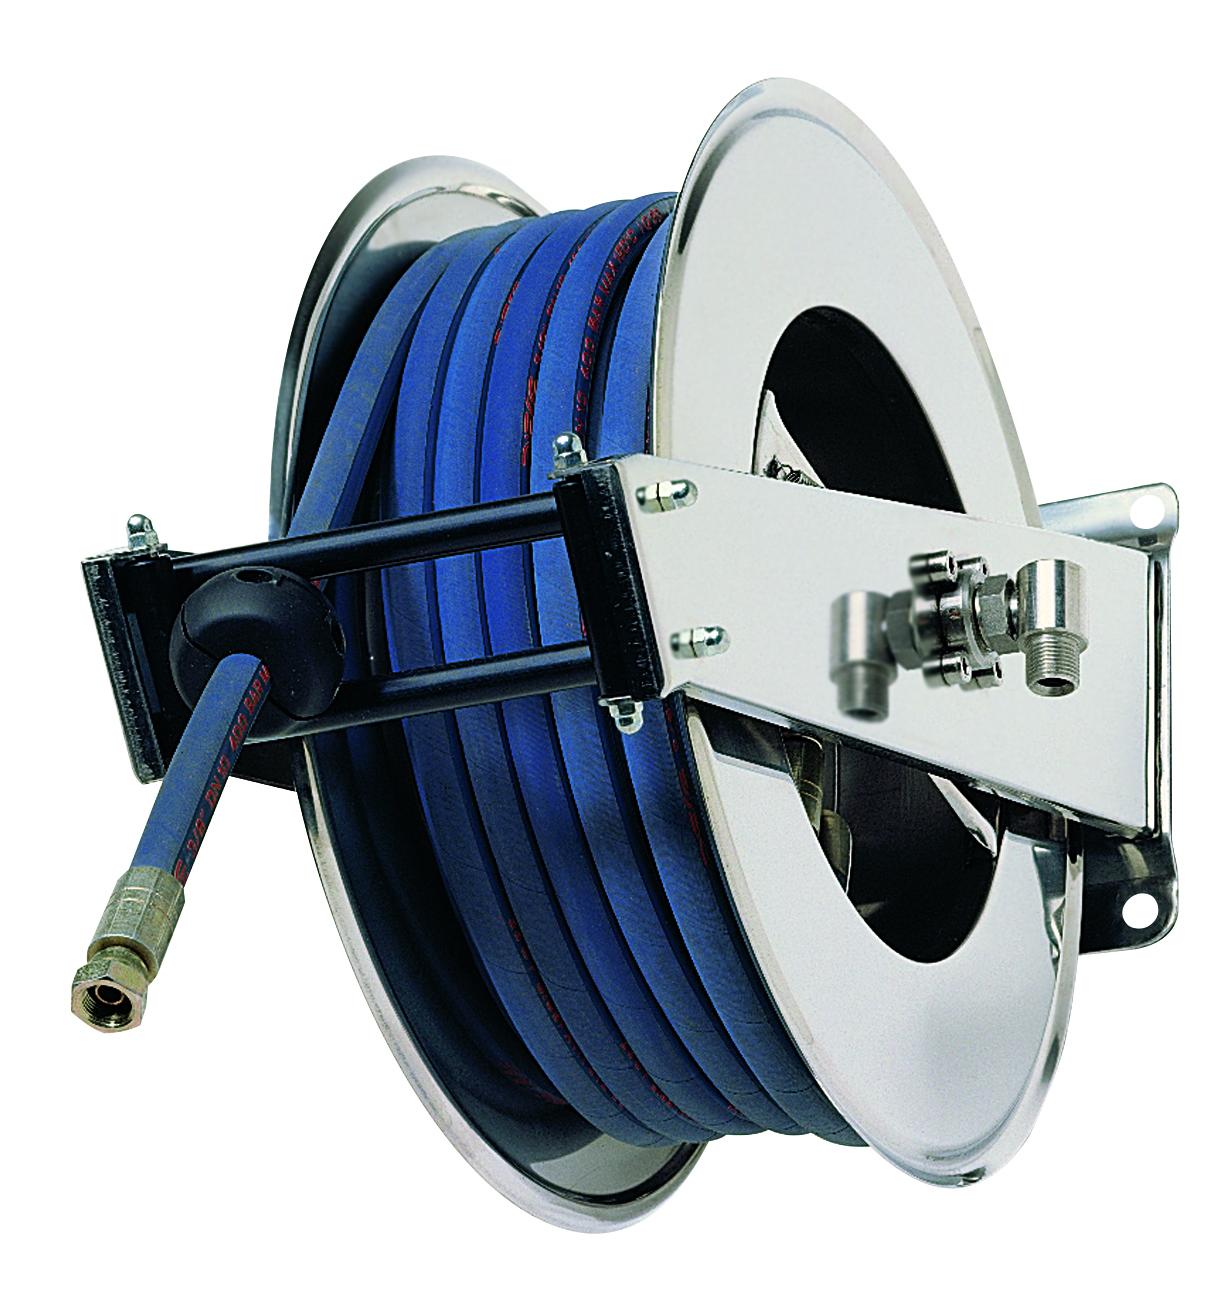 AV2000 - Hose reels Water Standard Pressure 0-200 Bar/0-2900 PSI